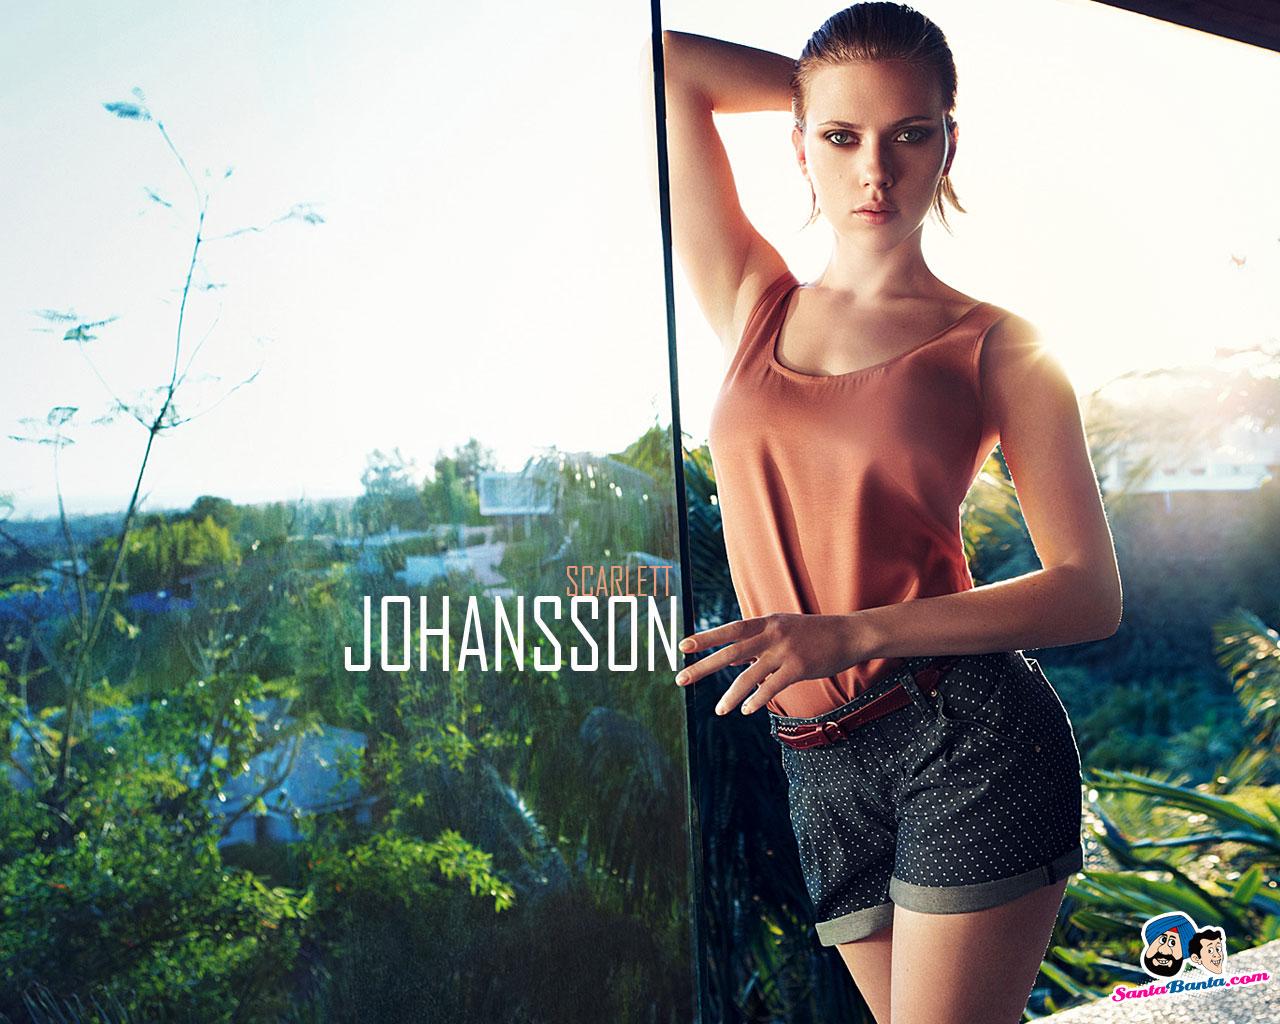 scarlett johansson images scarlett johansson hd wallpaper and